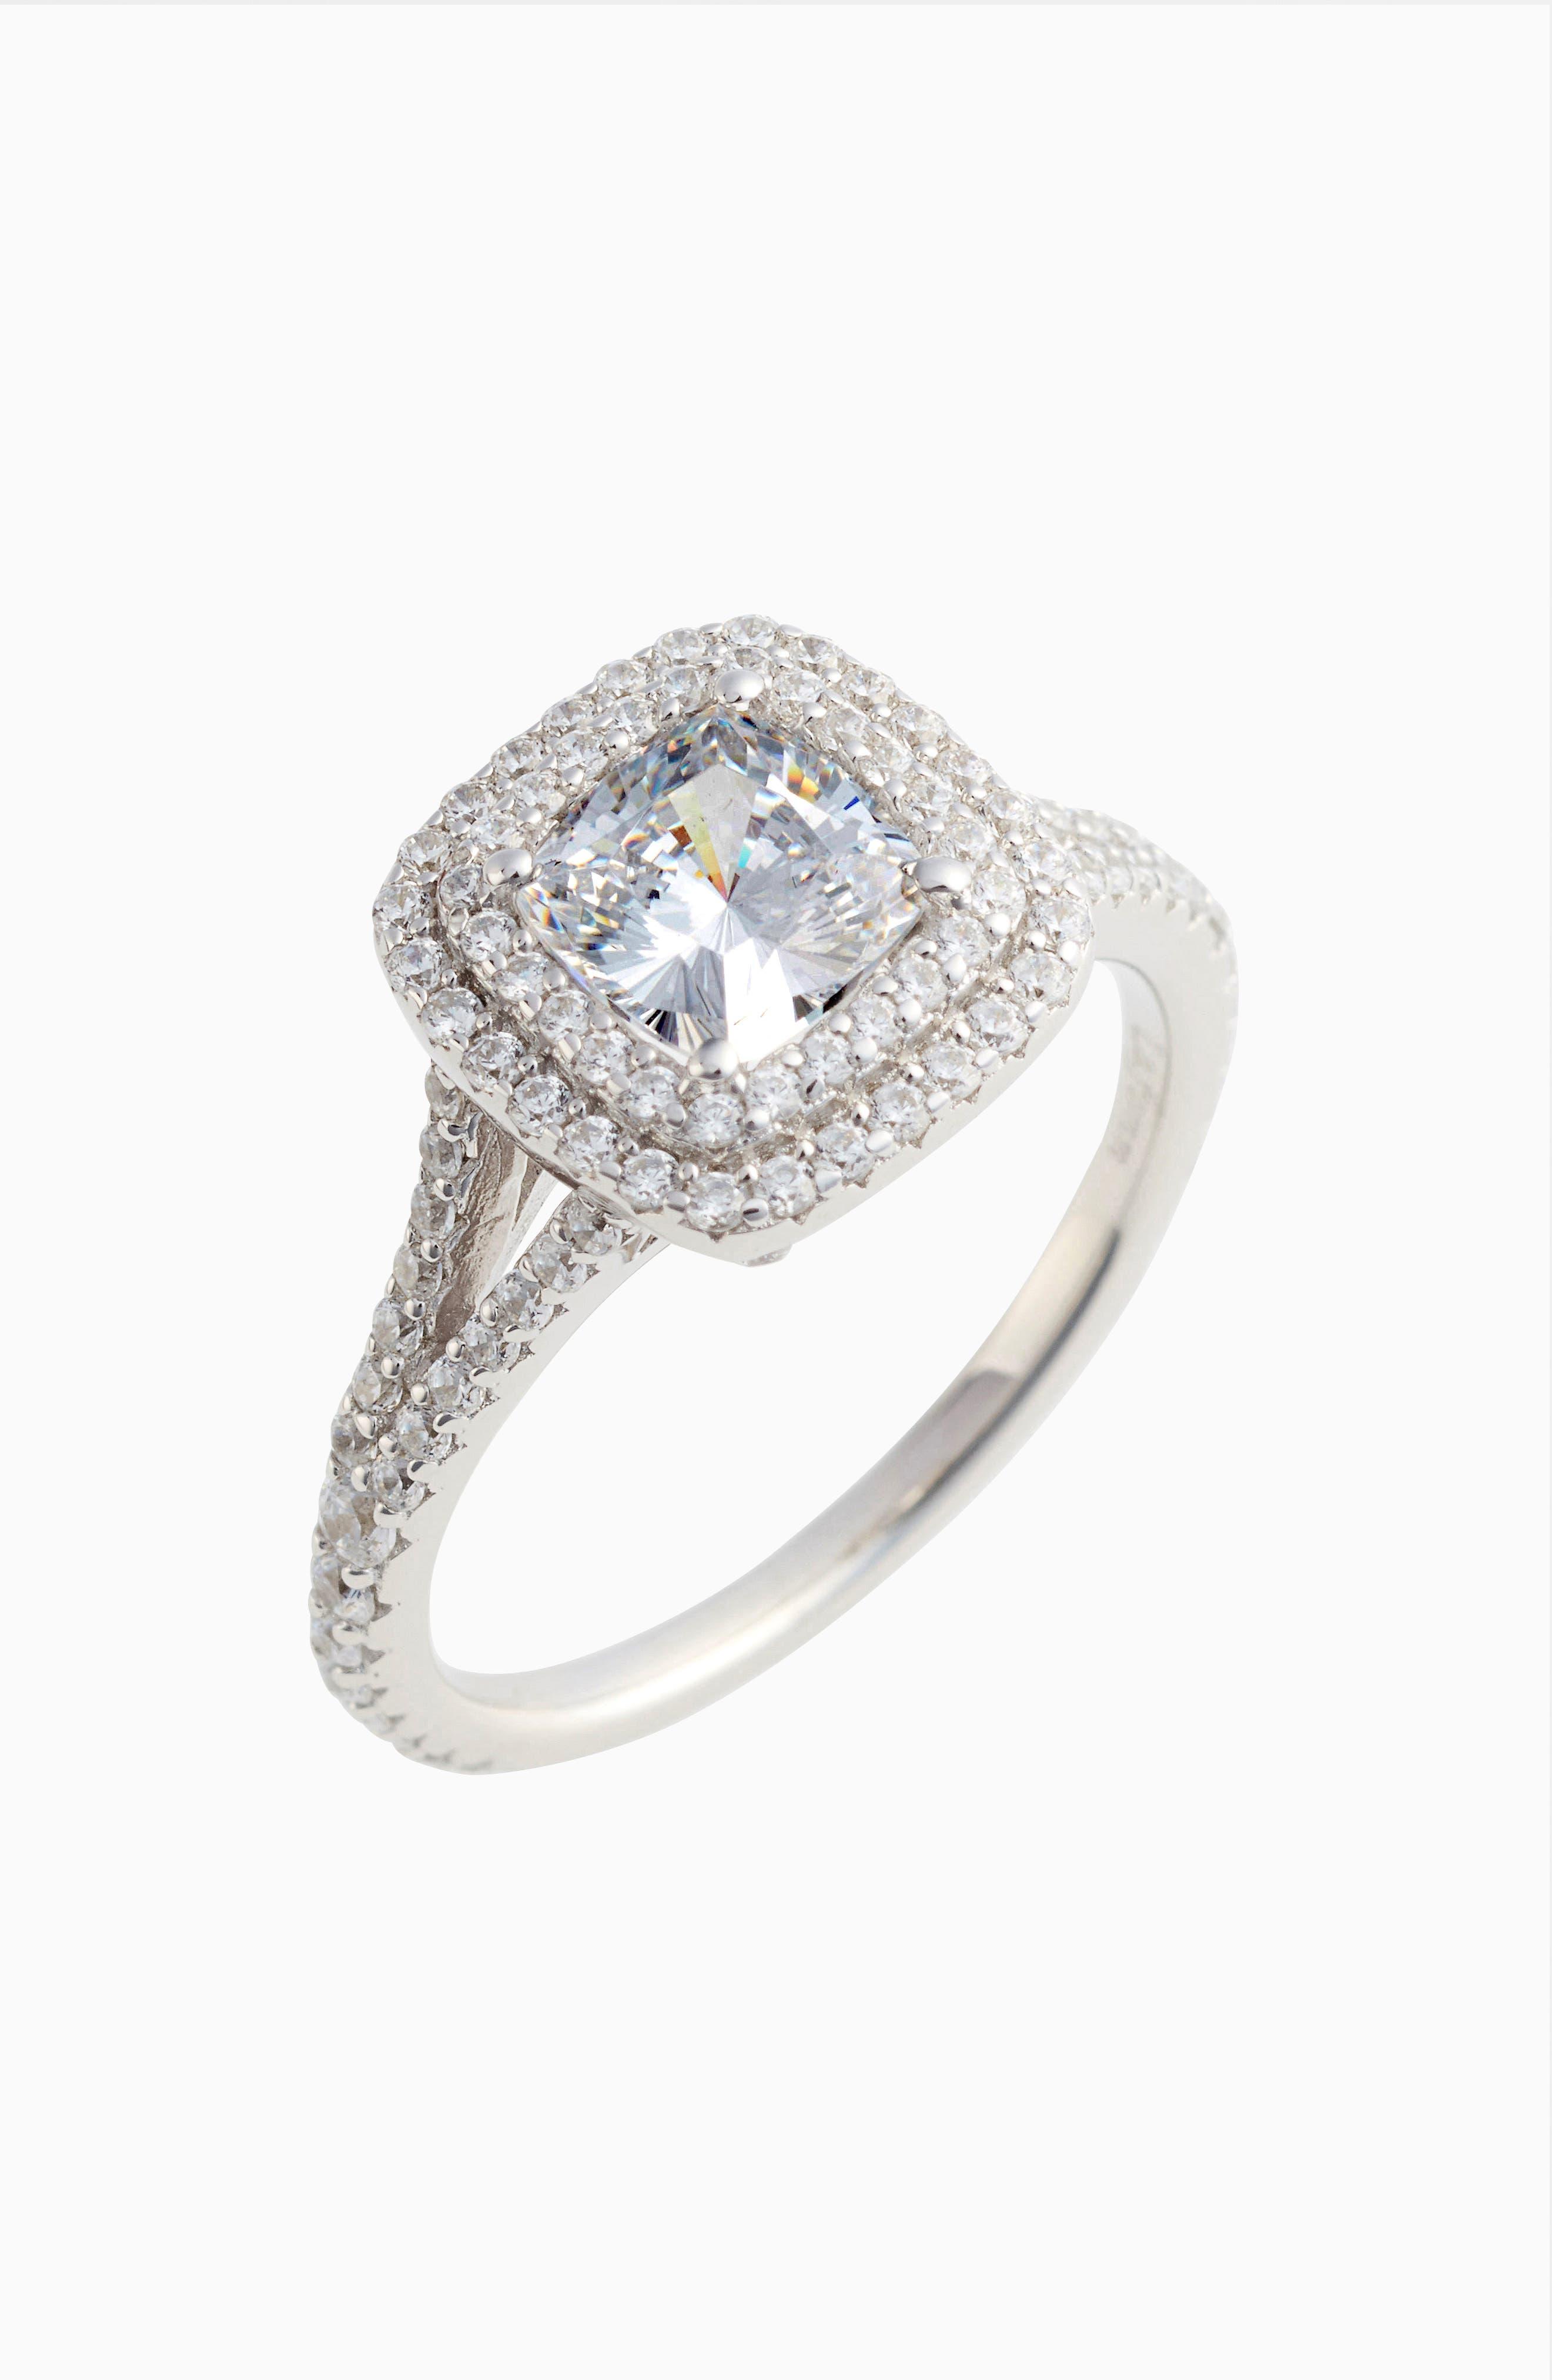 Double Halo Simulated Diamond Ring,                             Main thumbnail 1, color,                             040